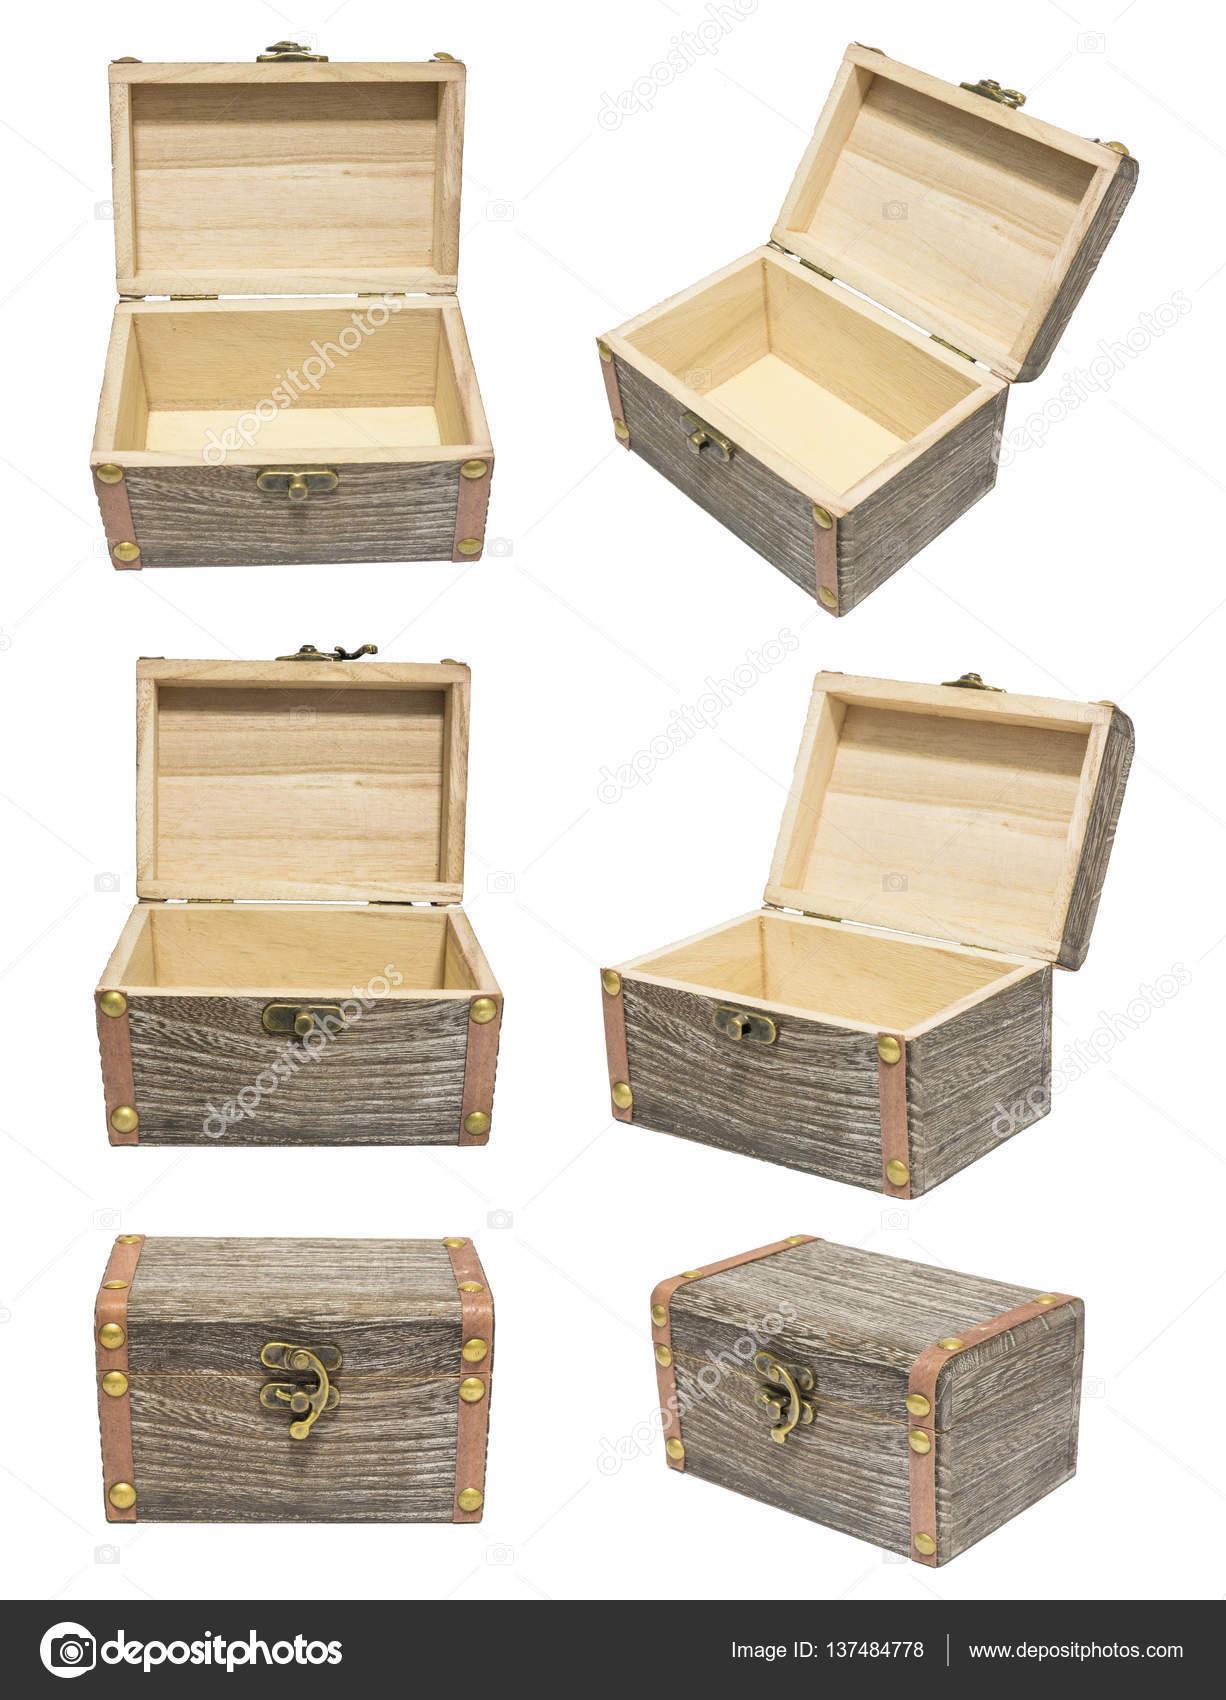 alte vintage geschlossen/offen variation winkel box holz kiste truhe